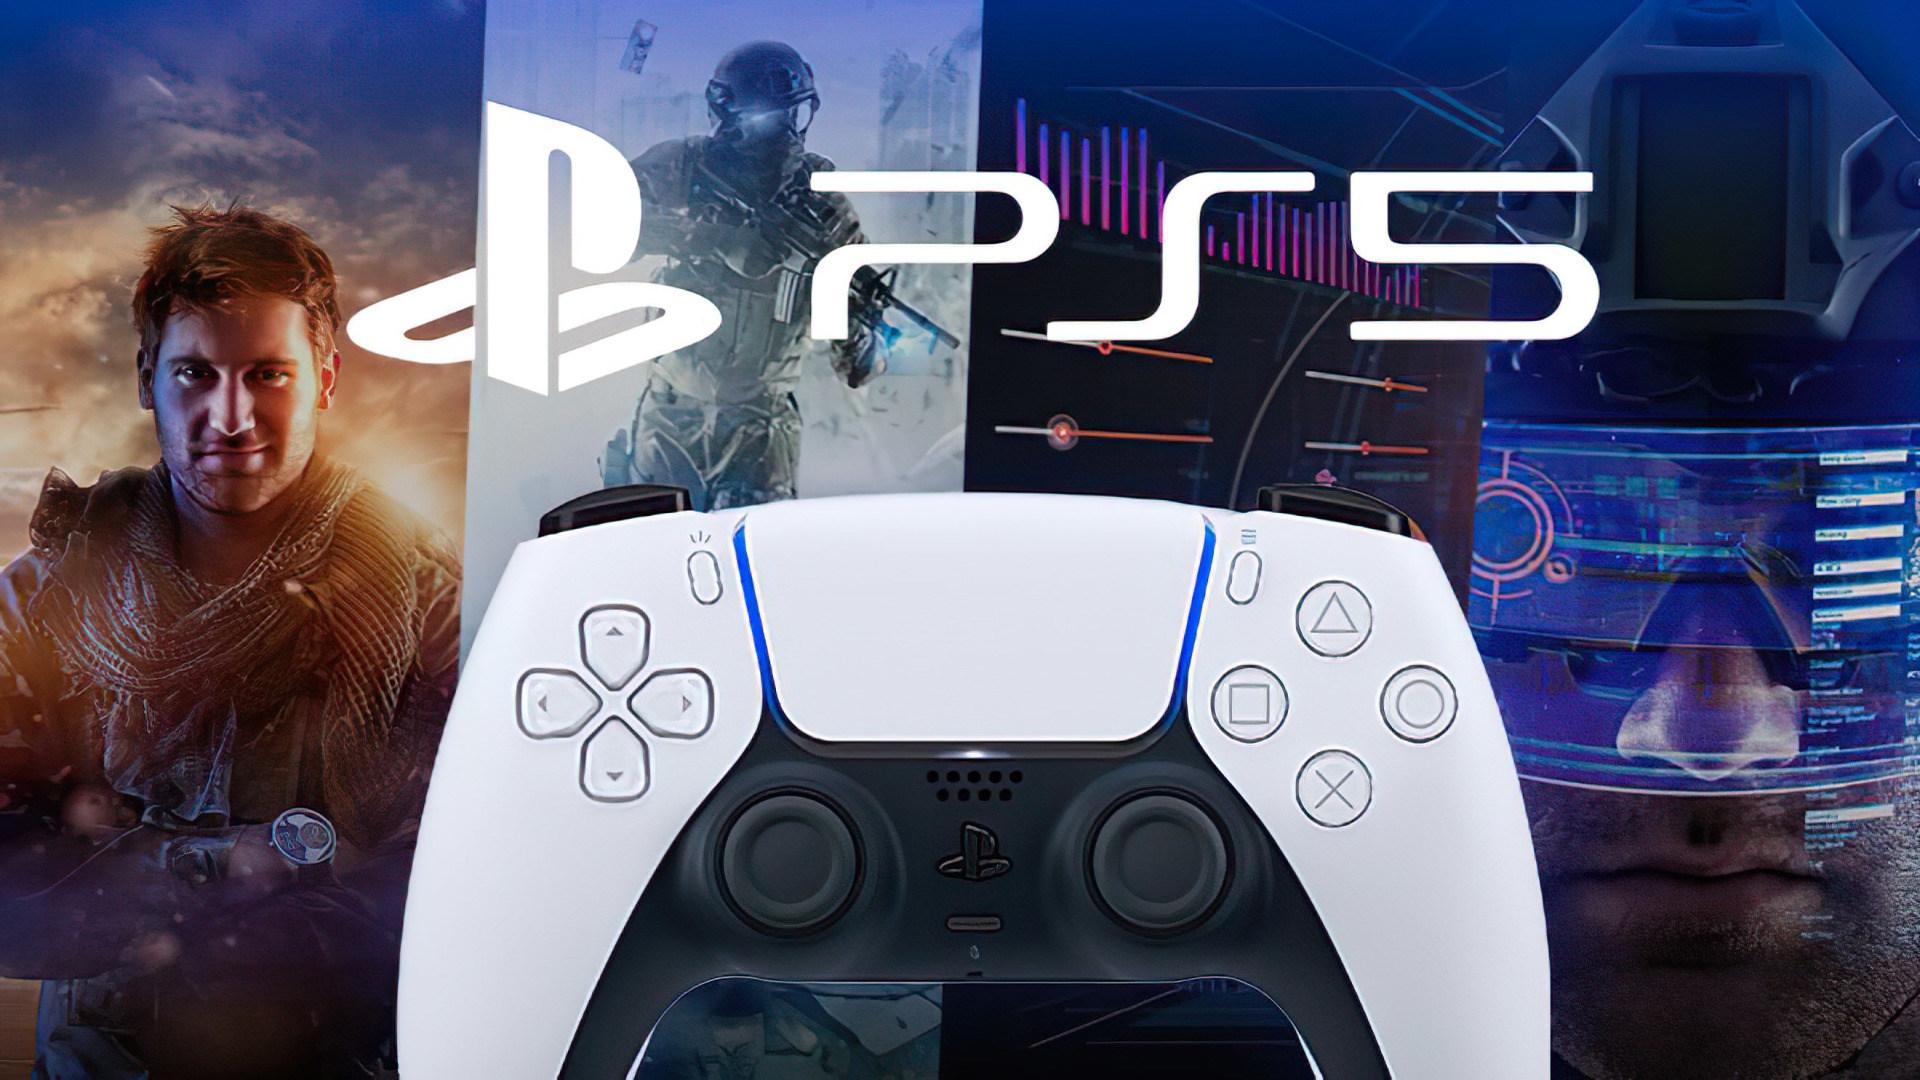 Gaming, Sony, Konsolen, Spielekonsolen, PlayStation 5, ps5, Sony PlayStation 5, Playstation Dualsense, PlayStation 5 Controller